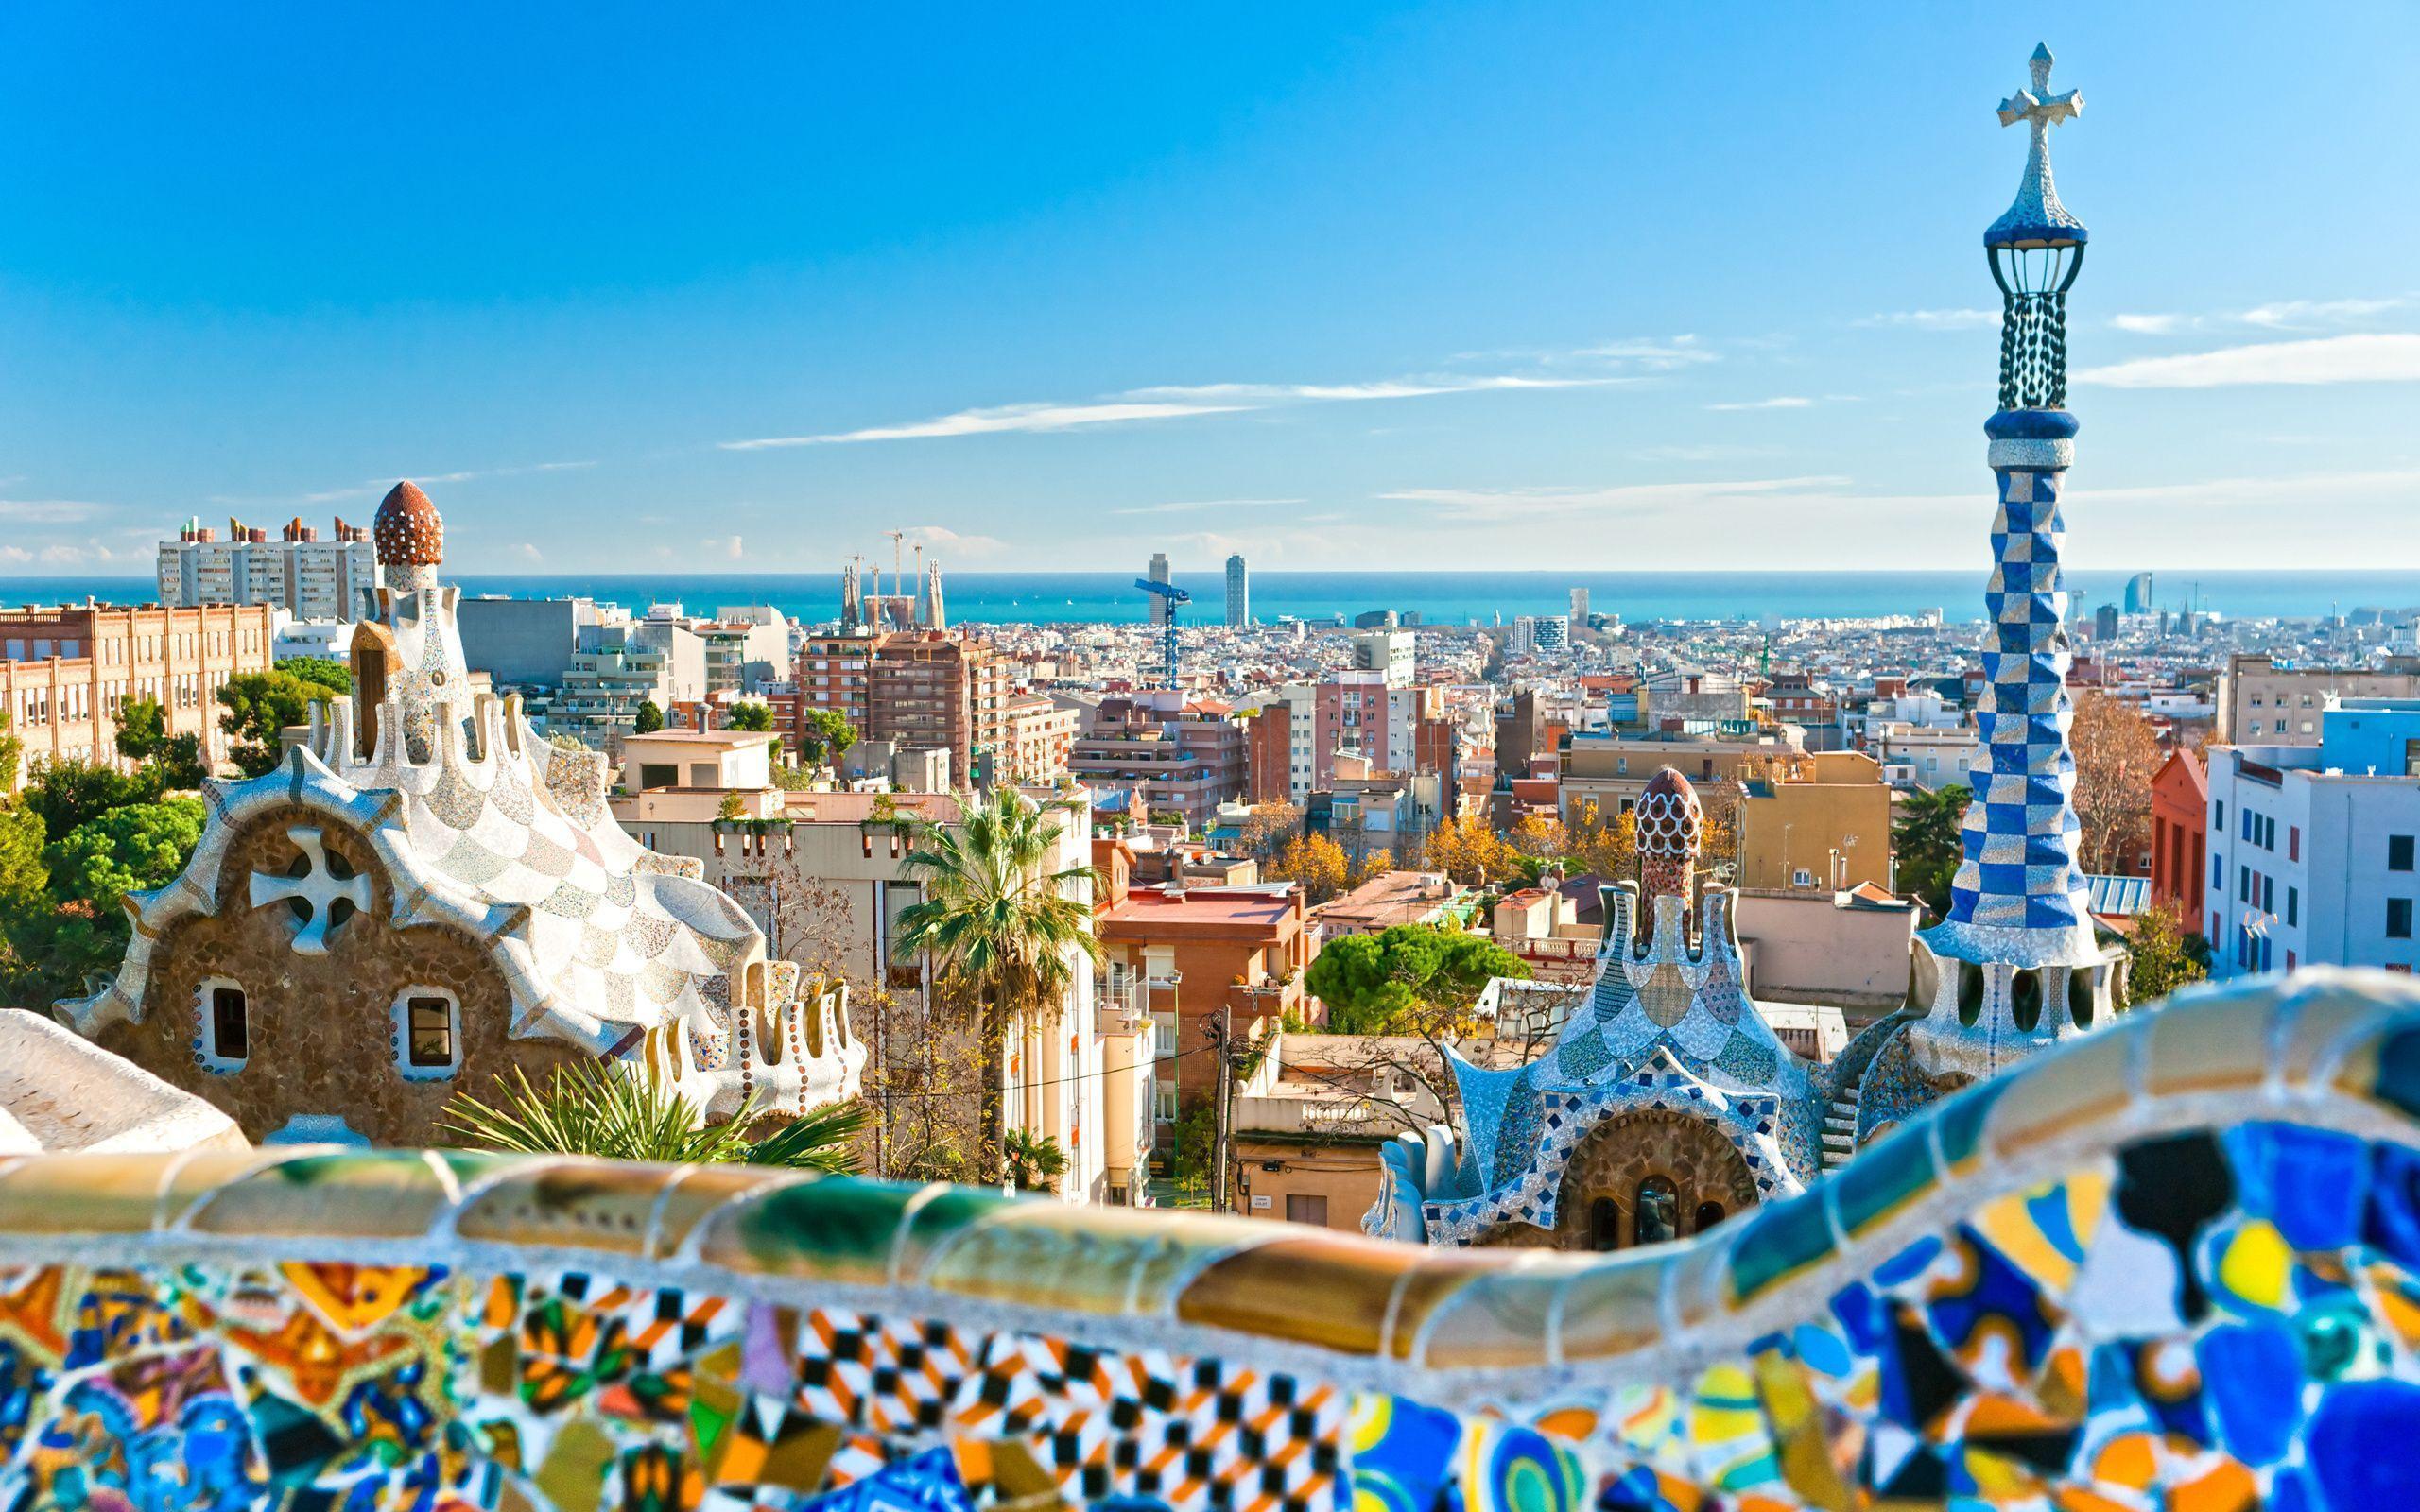 Barcelona City Wallpapers - Wallpaper Cave